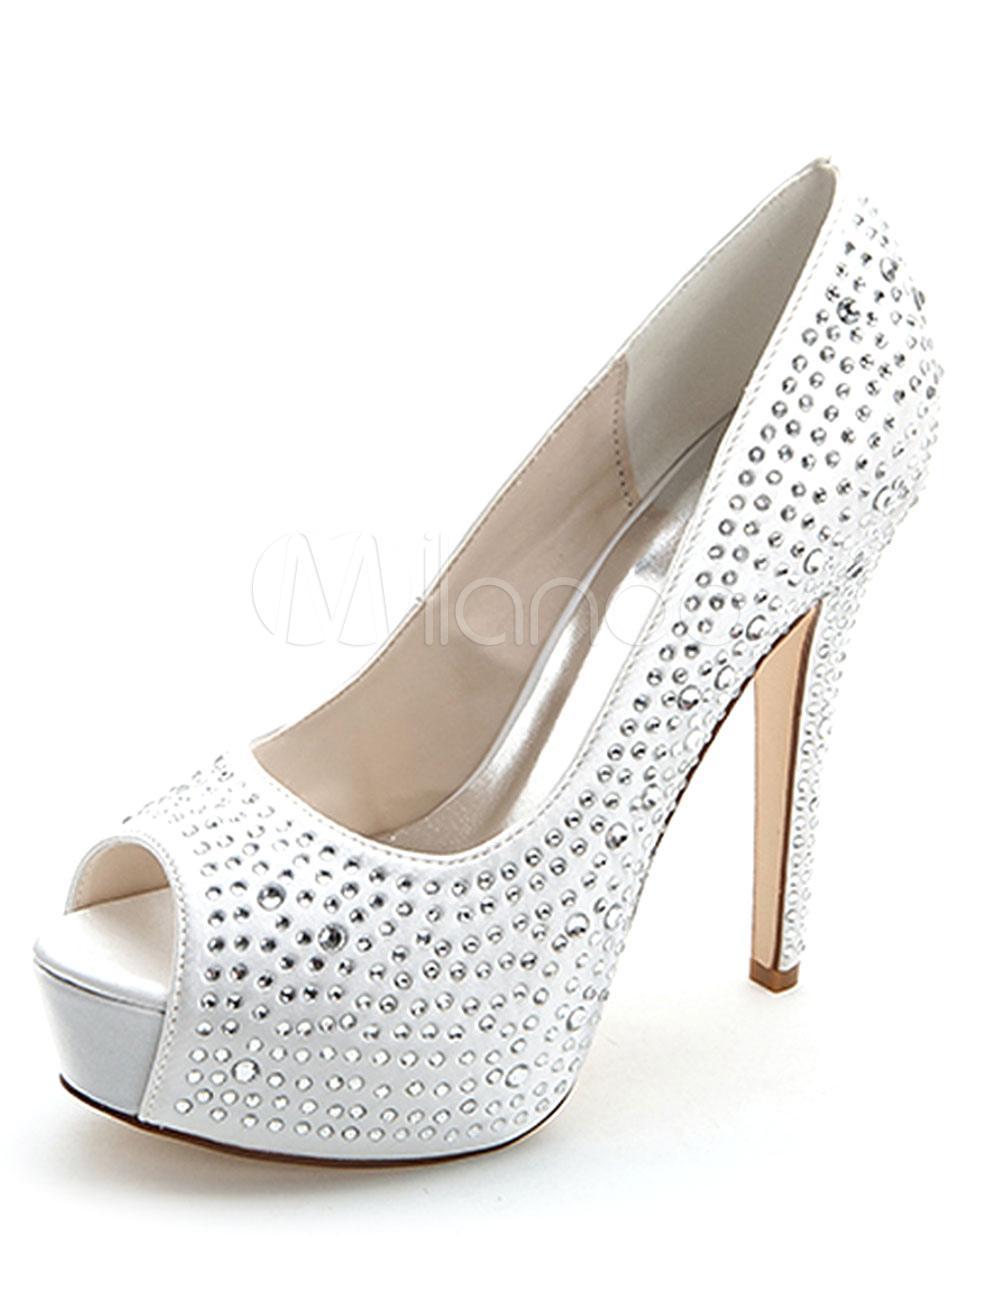 Glittery Rhinestone Peep Toe Bridal Pumps